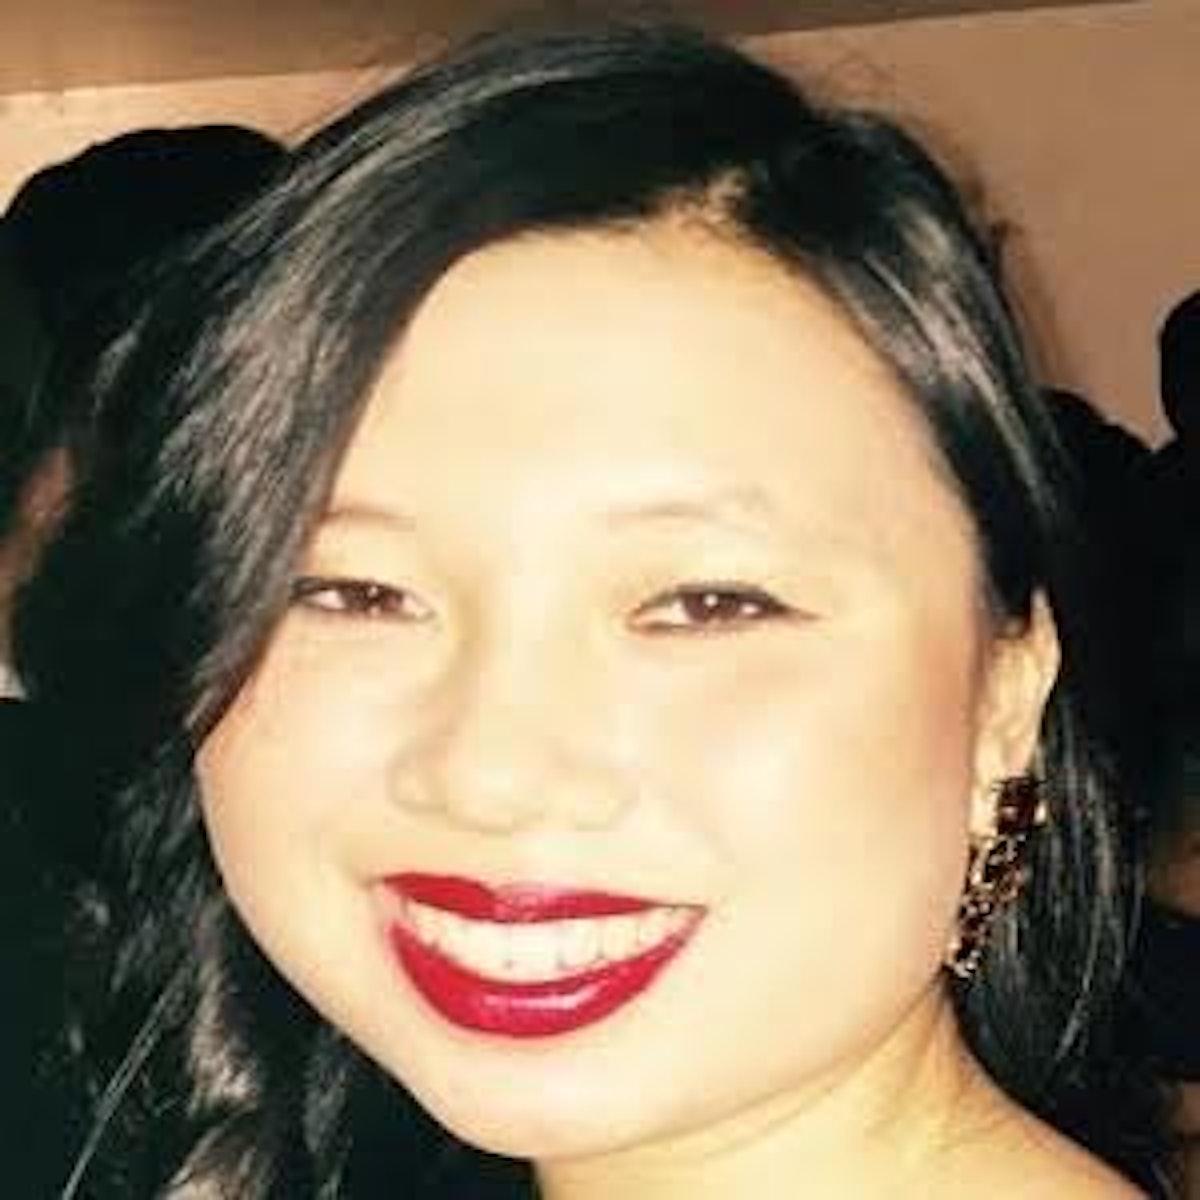 Courtney Han